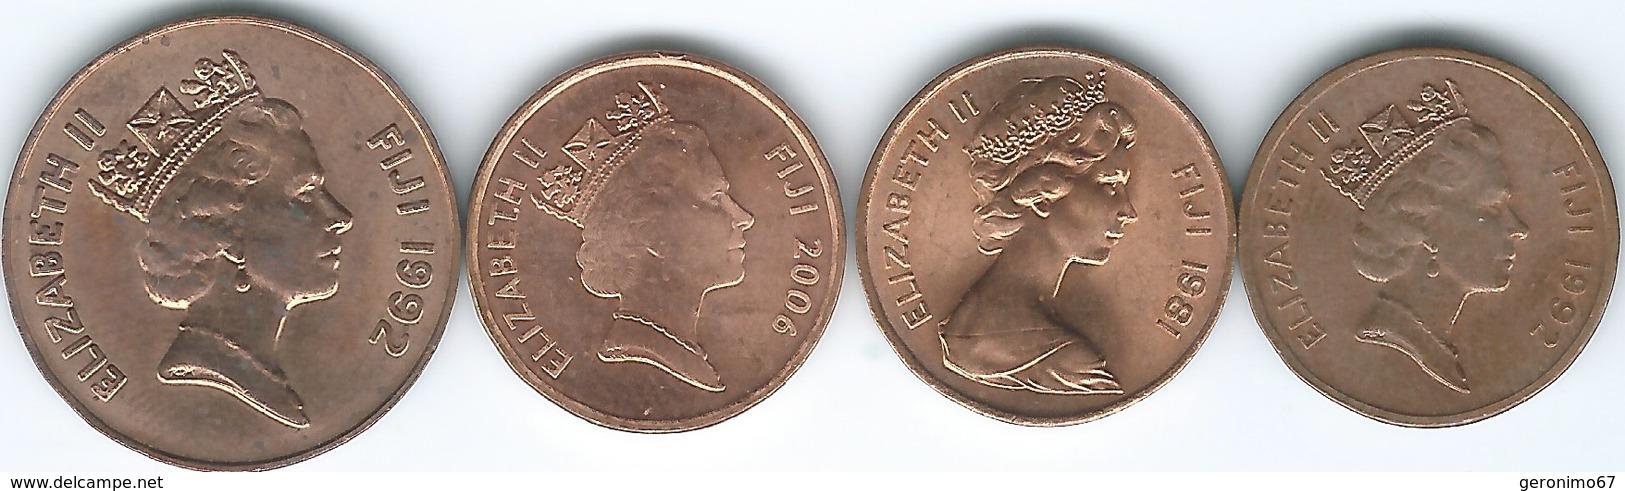 Fiji - 1 Cent - 1981 (KM39); 1992 (KM49a); 2006 (KM49b); 2 Cents - 1992 (KM50a) - Fidji